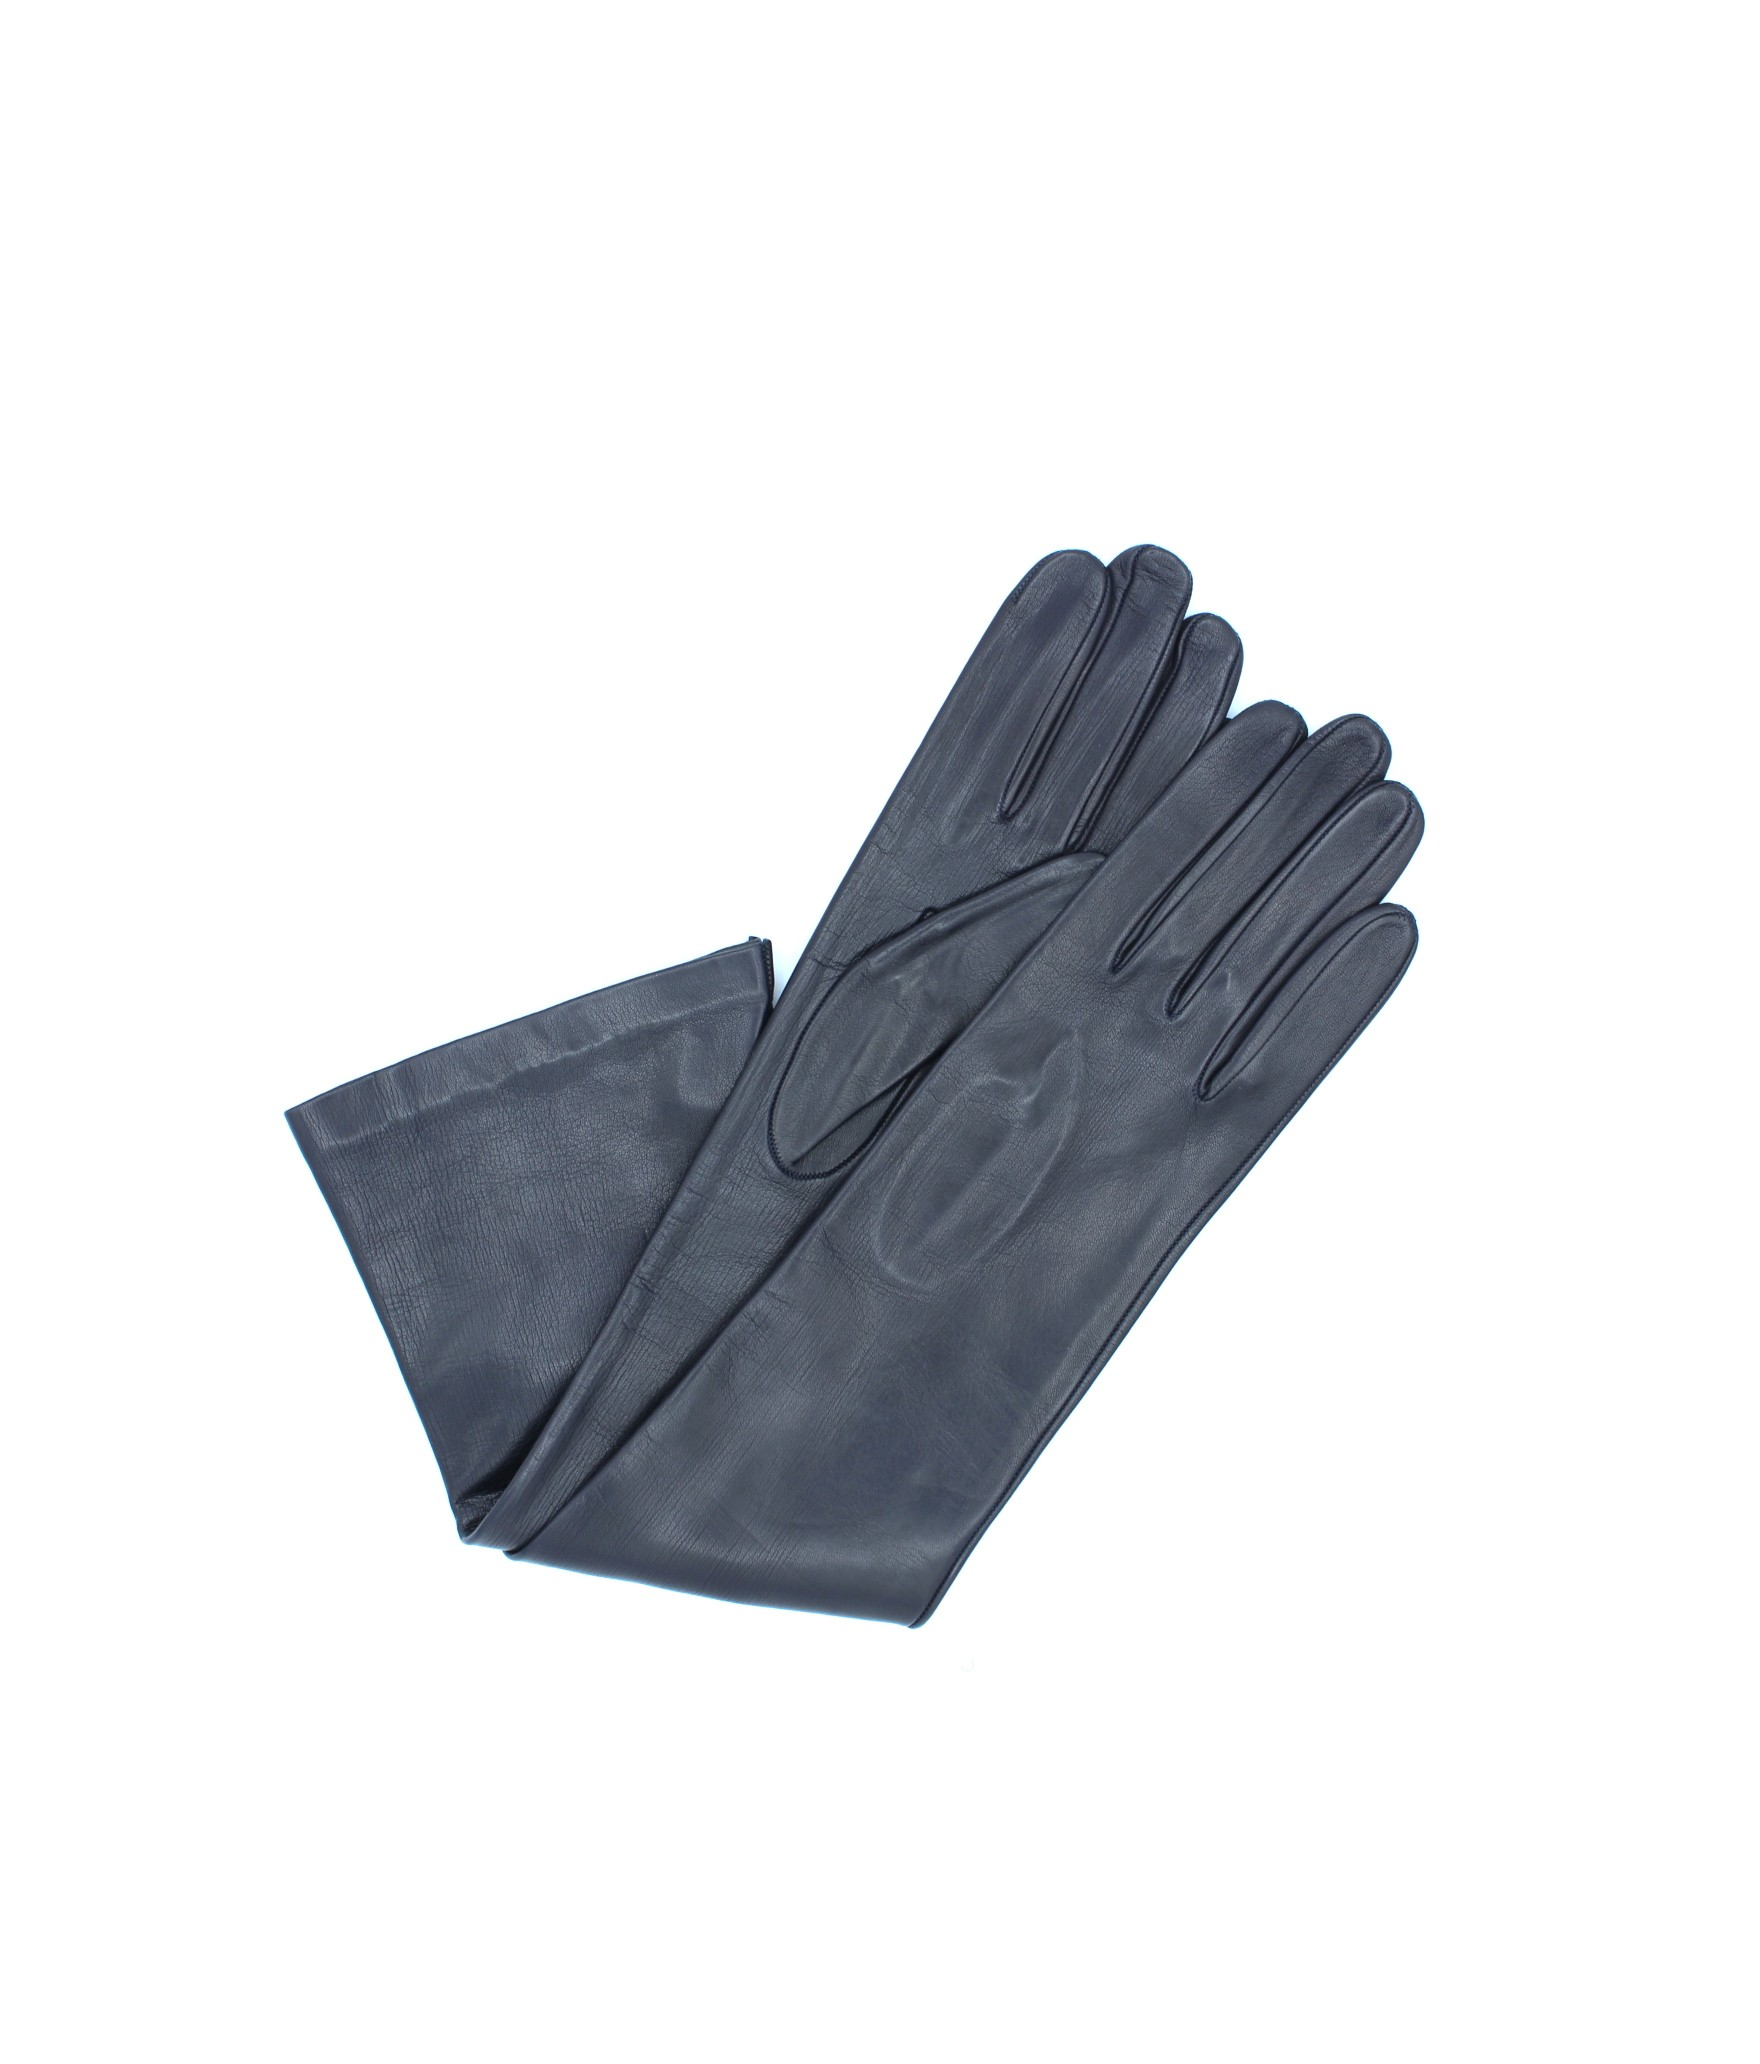 Nappa leather gloves 10bt silk lined Navy Sermoneta Gloves